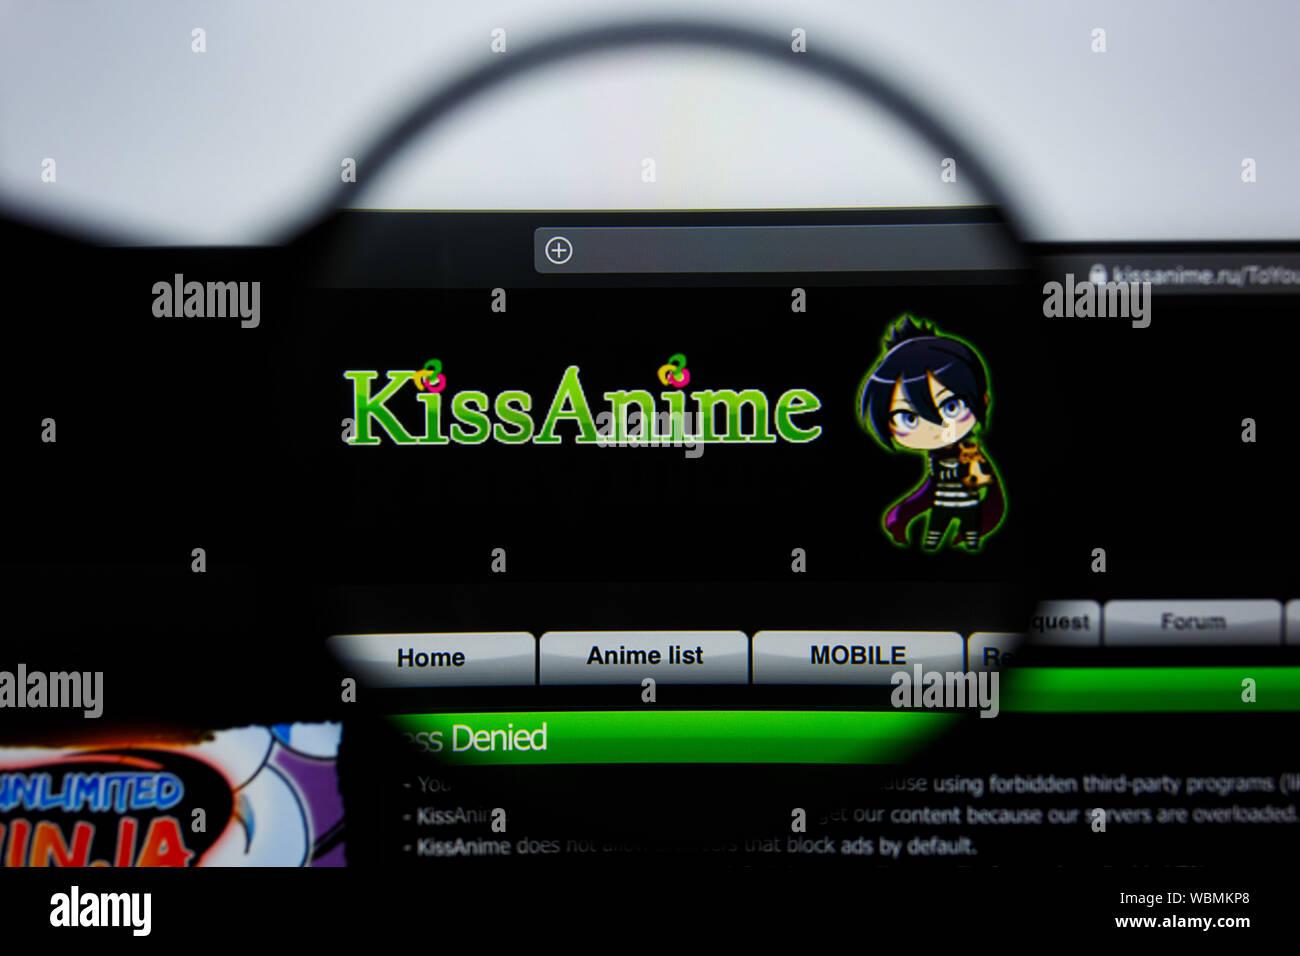 Kissanimex